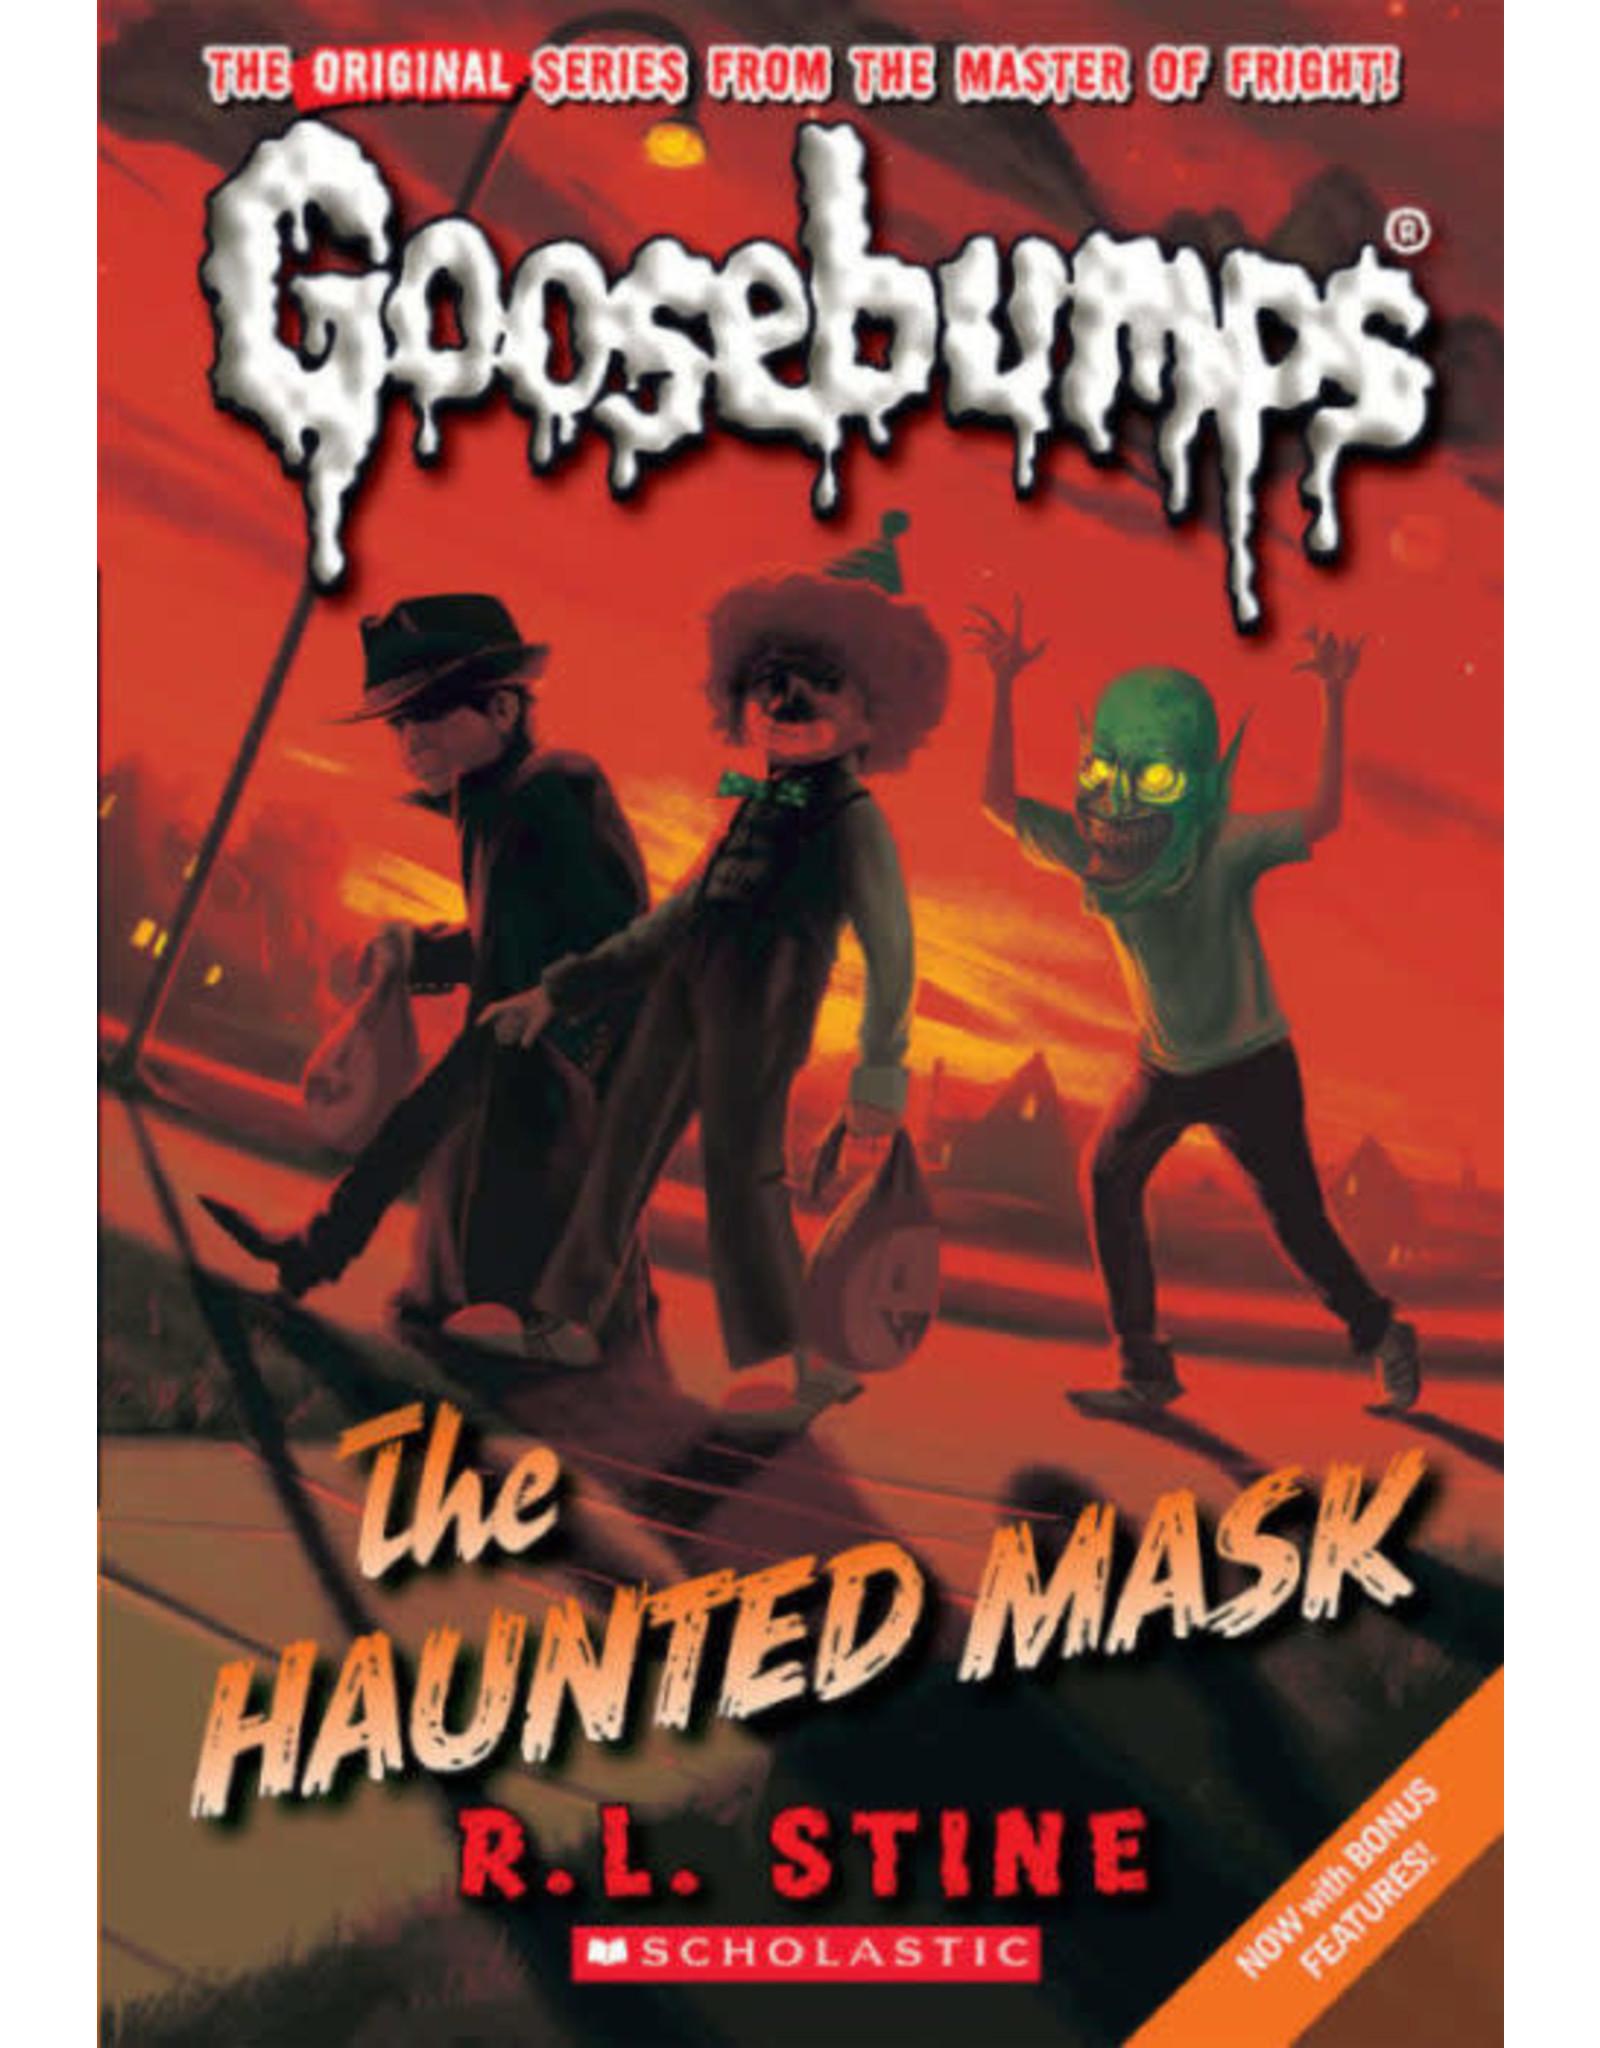 Scholastic Classic Goosebumps #4: The Haunted Mask